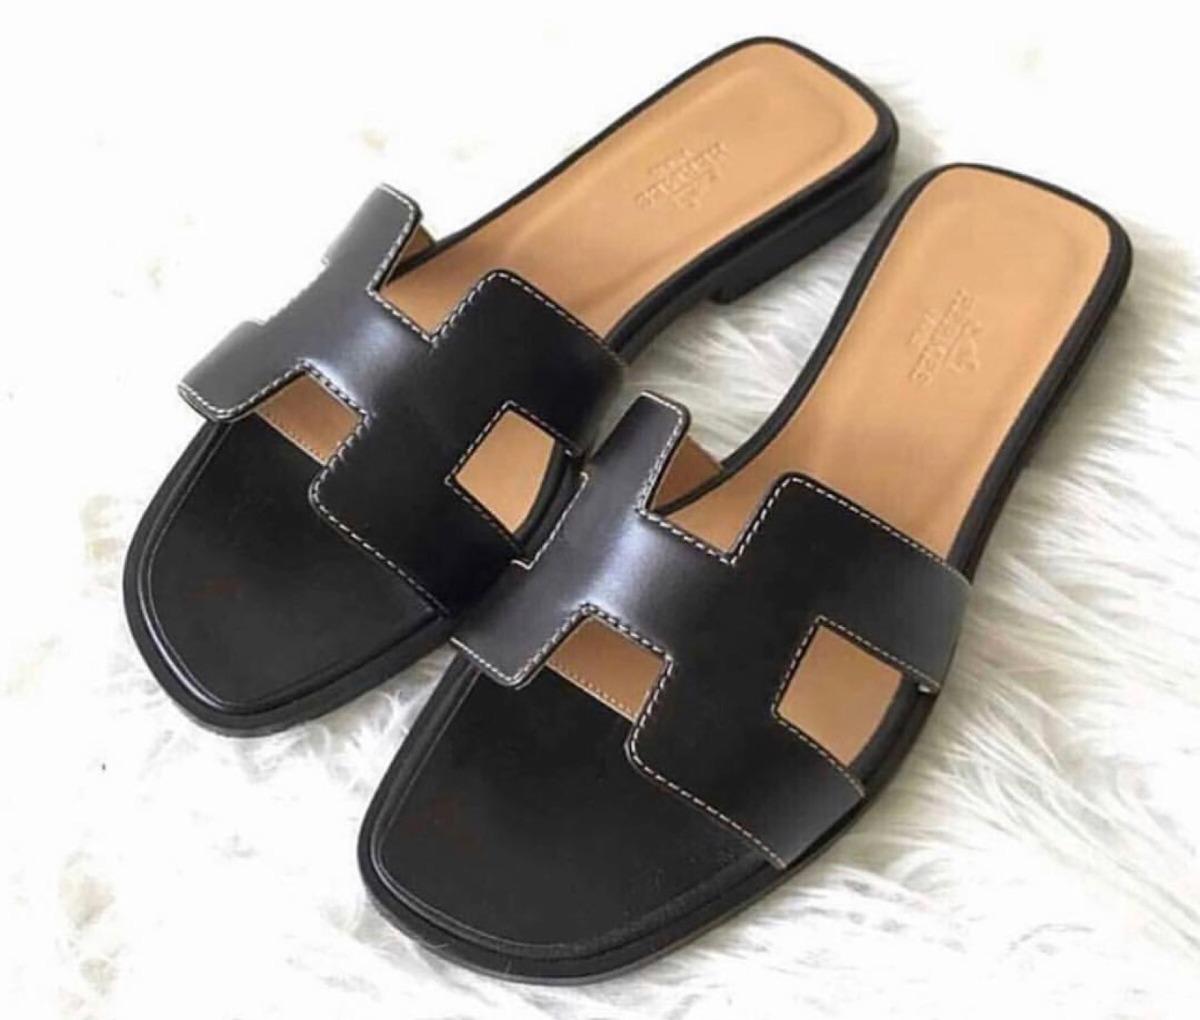 93bc71633f4 sandalia chinelo flat hermes preto feminino - pronta entrega. Carregando  zoom.